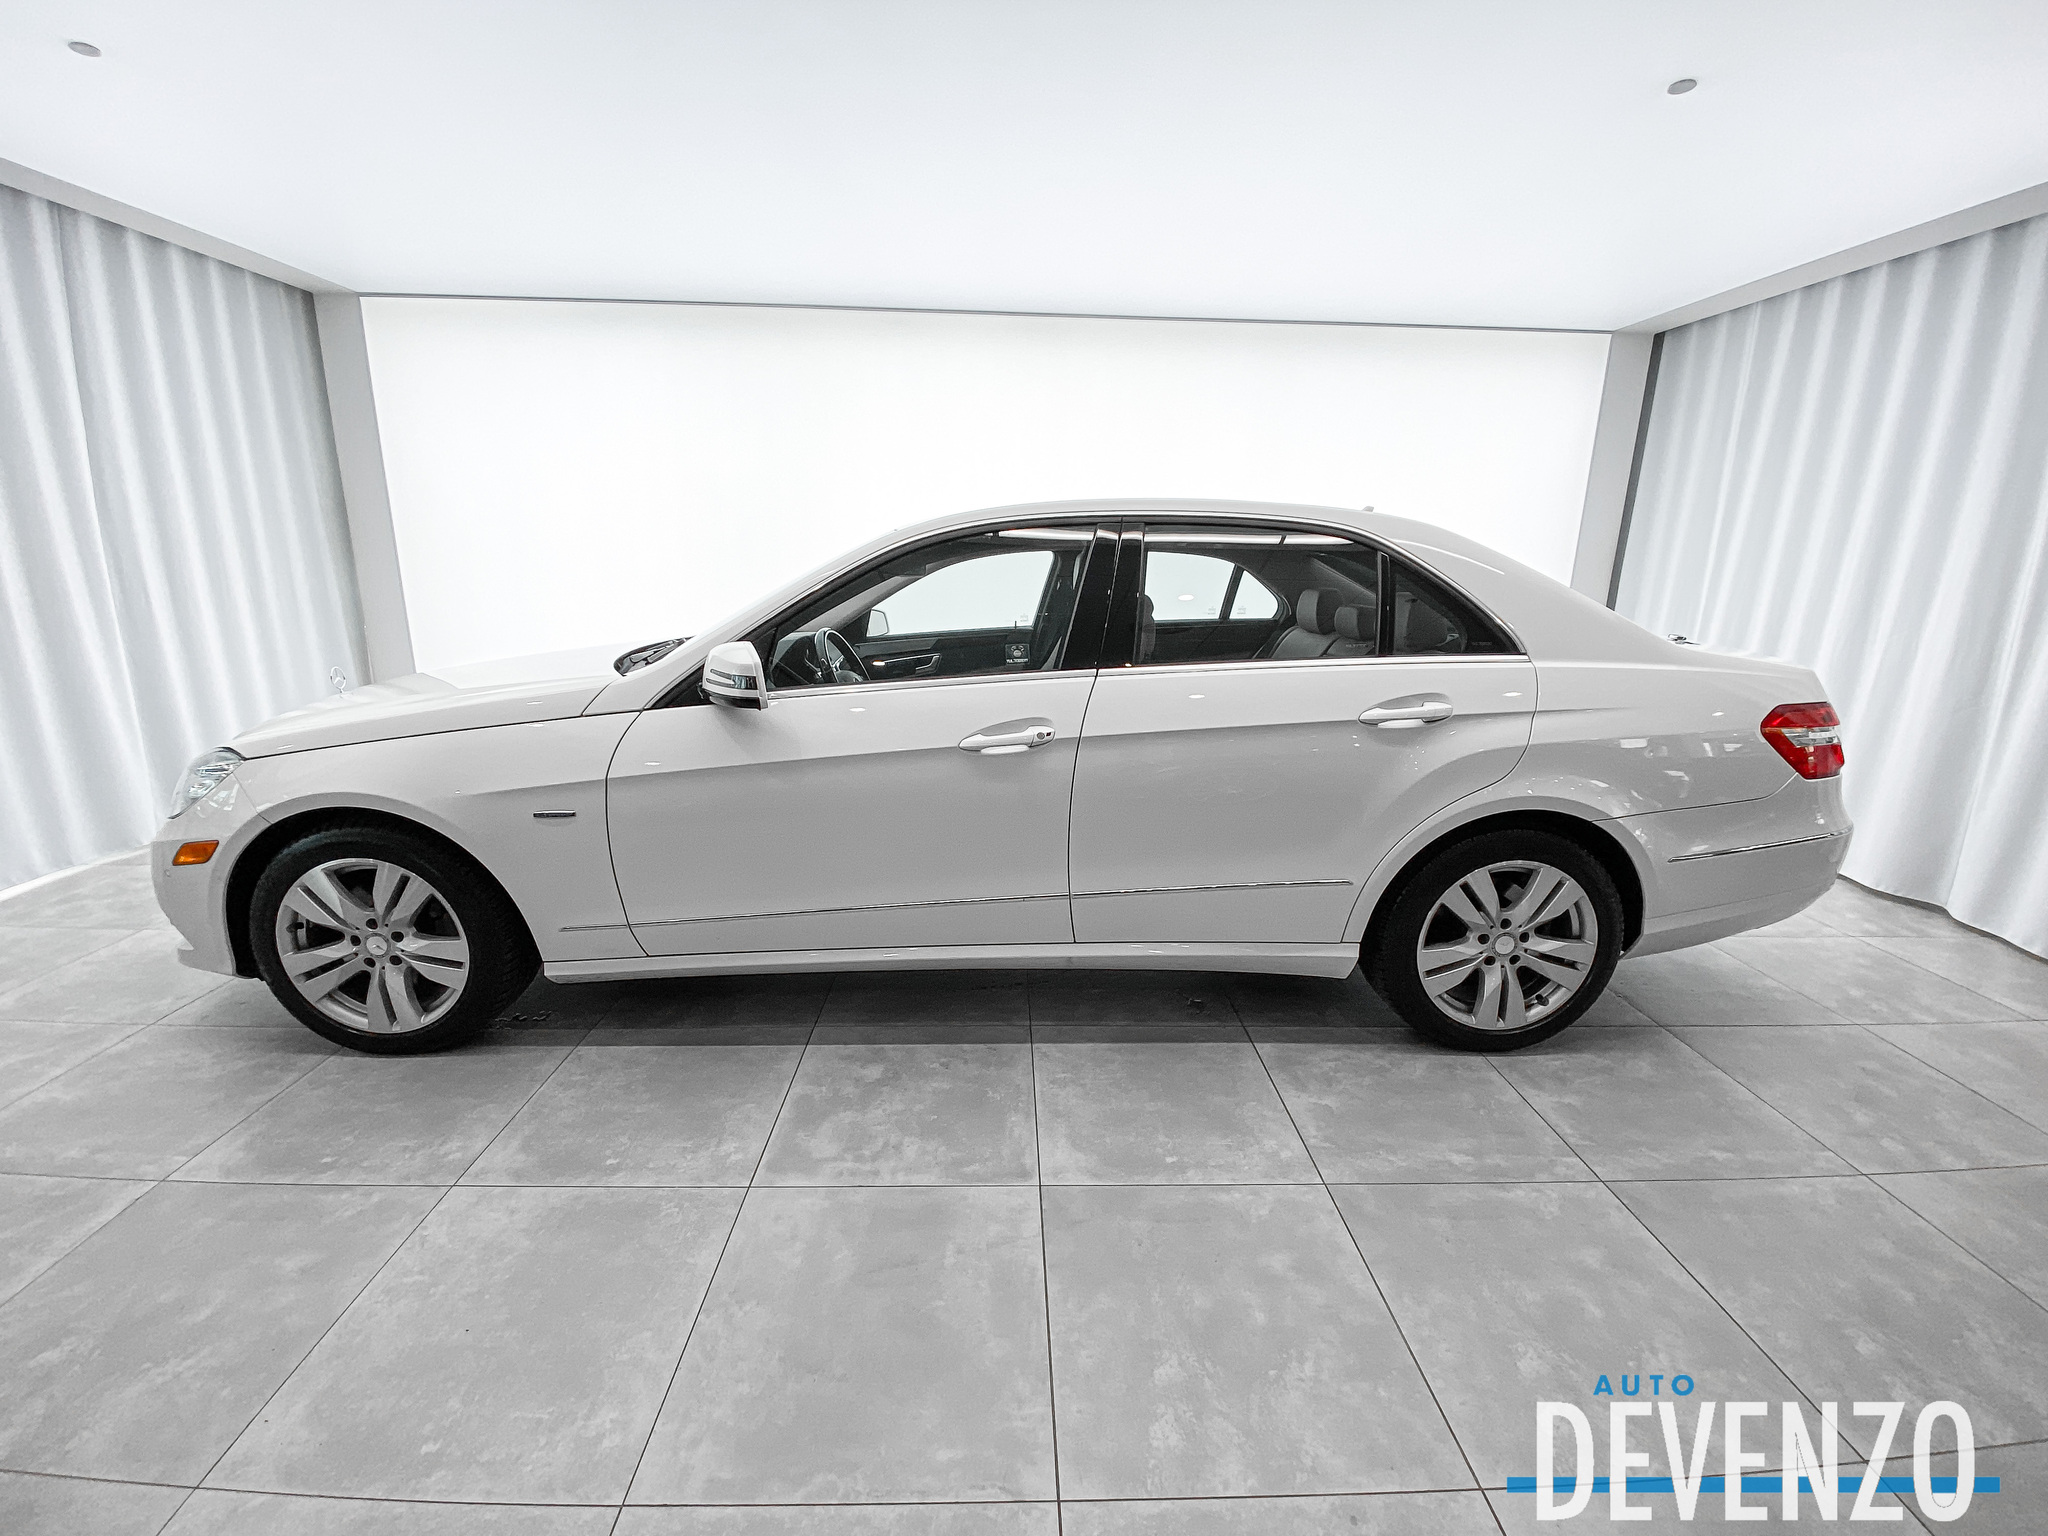 2012 Mercedes-Benz E-Class E300 V6 3.5 4MATIC Premium Package / Navi / Camera complet